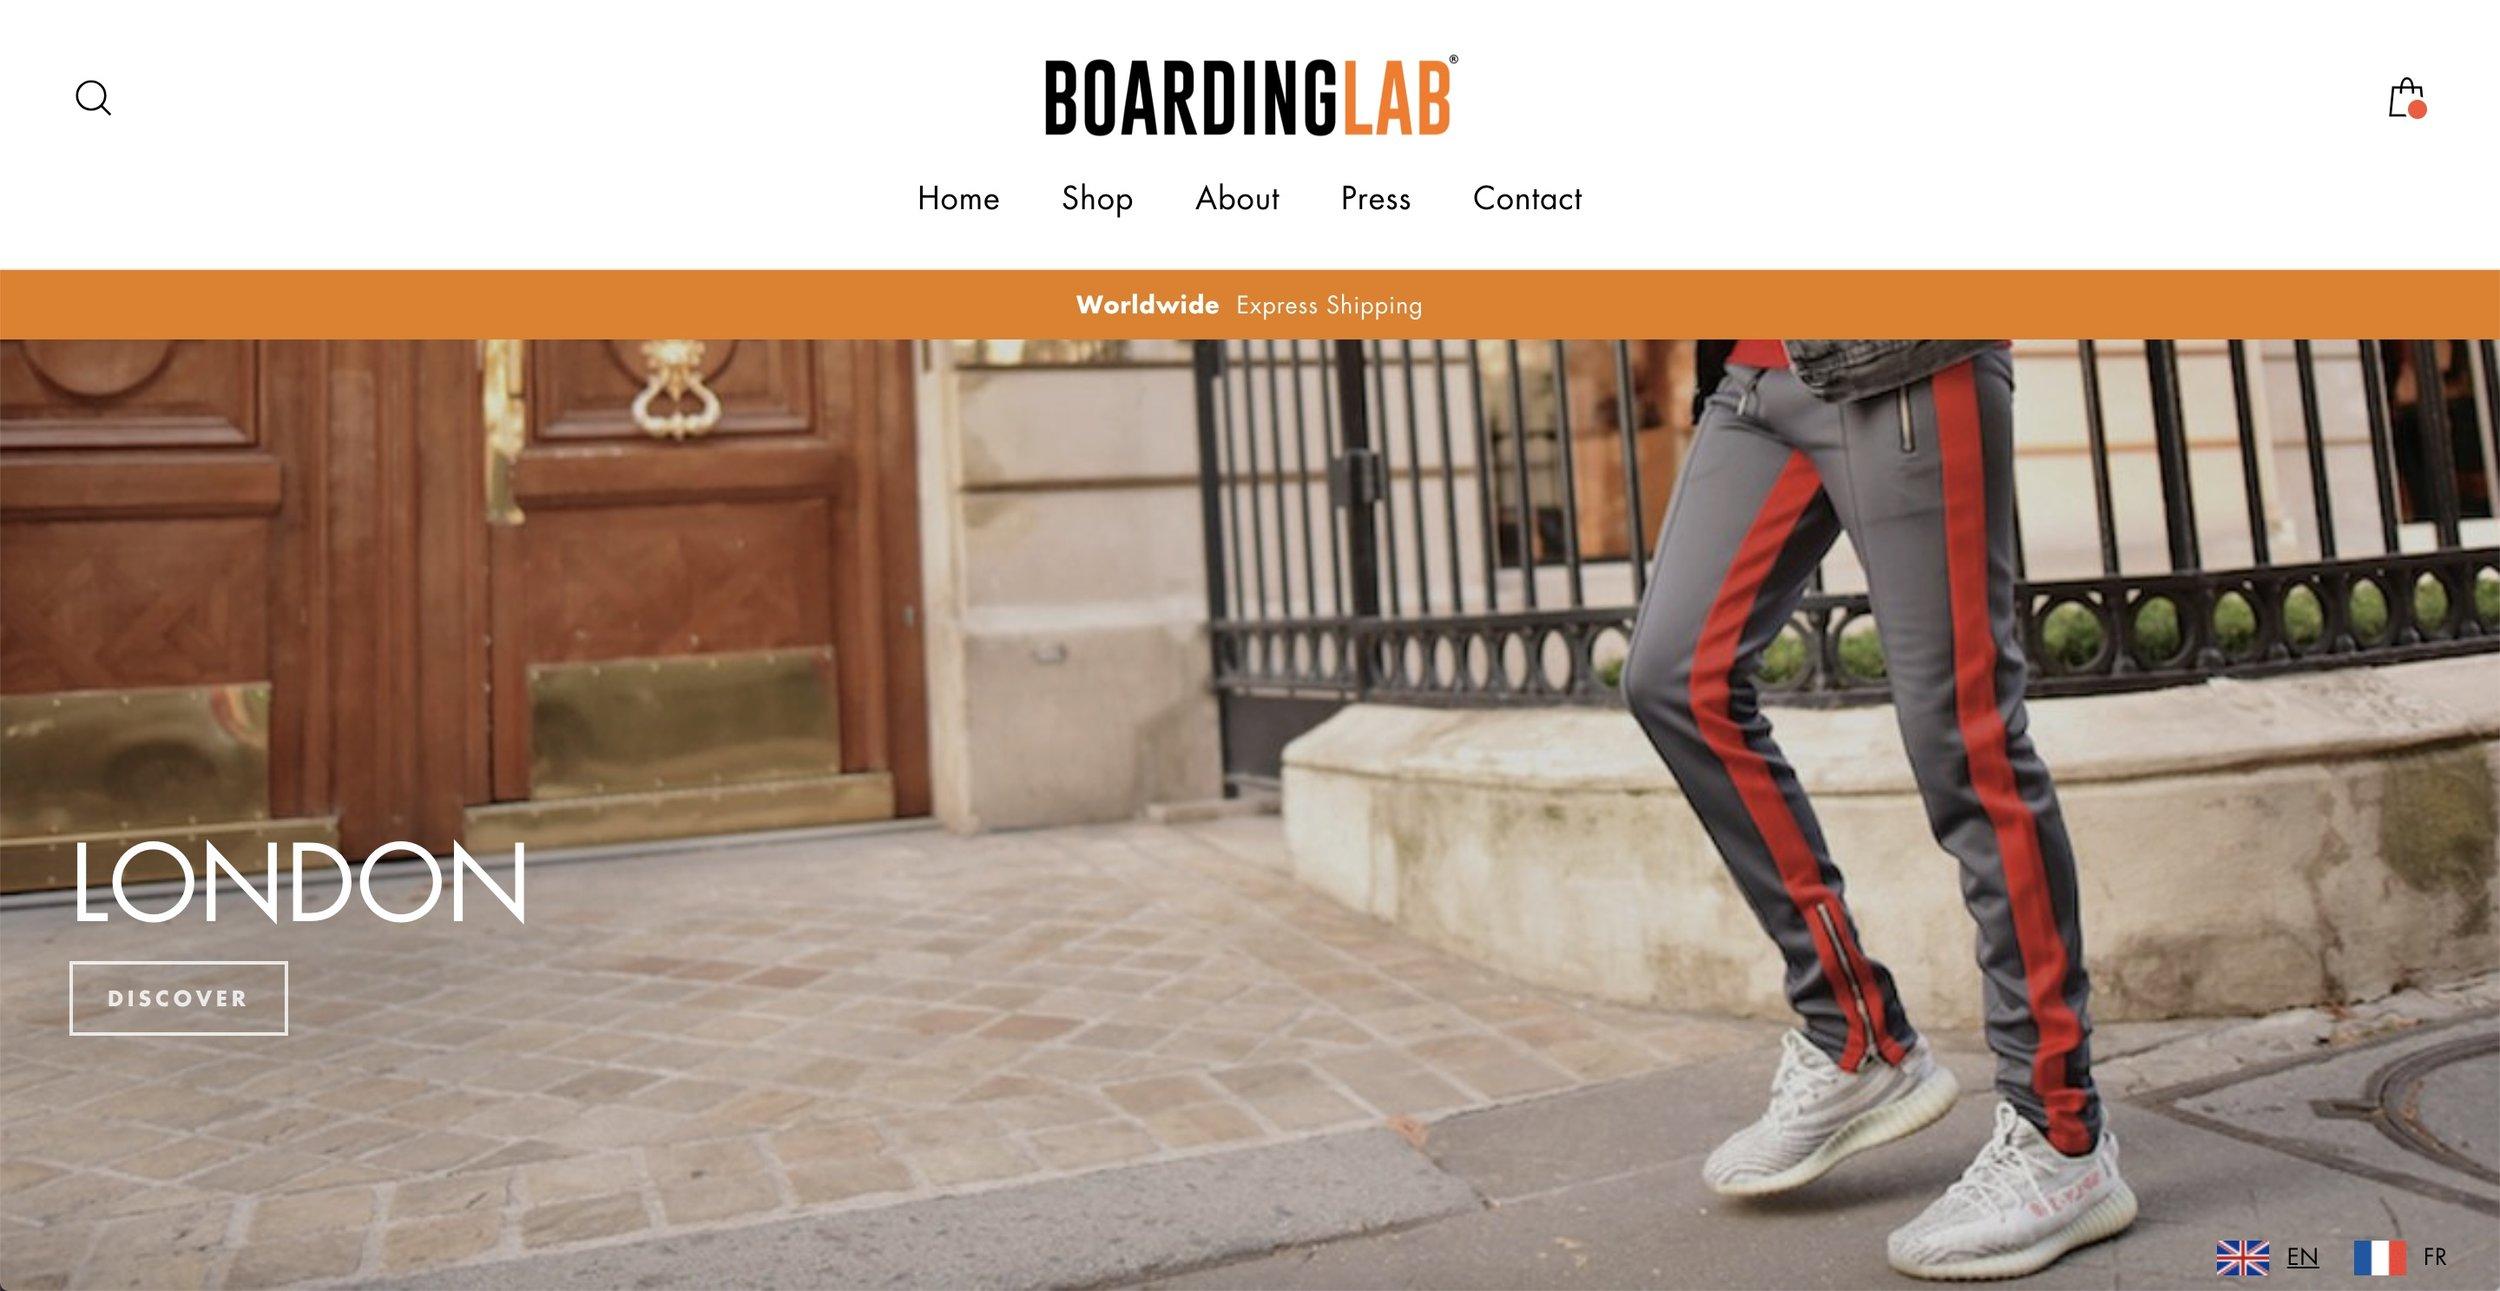 BOARDING LAB by agenceayoa